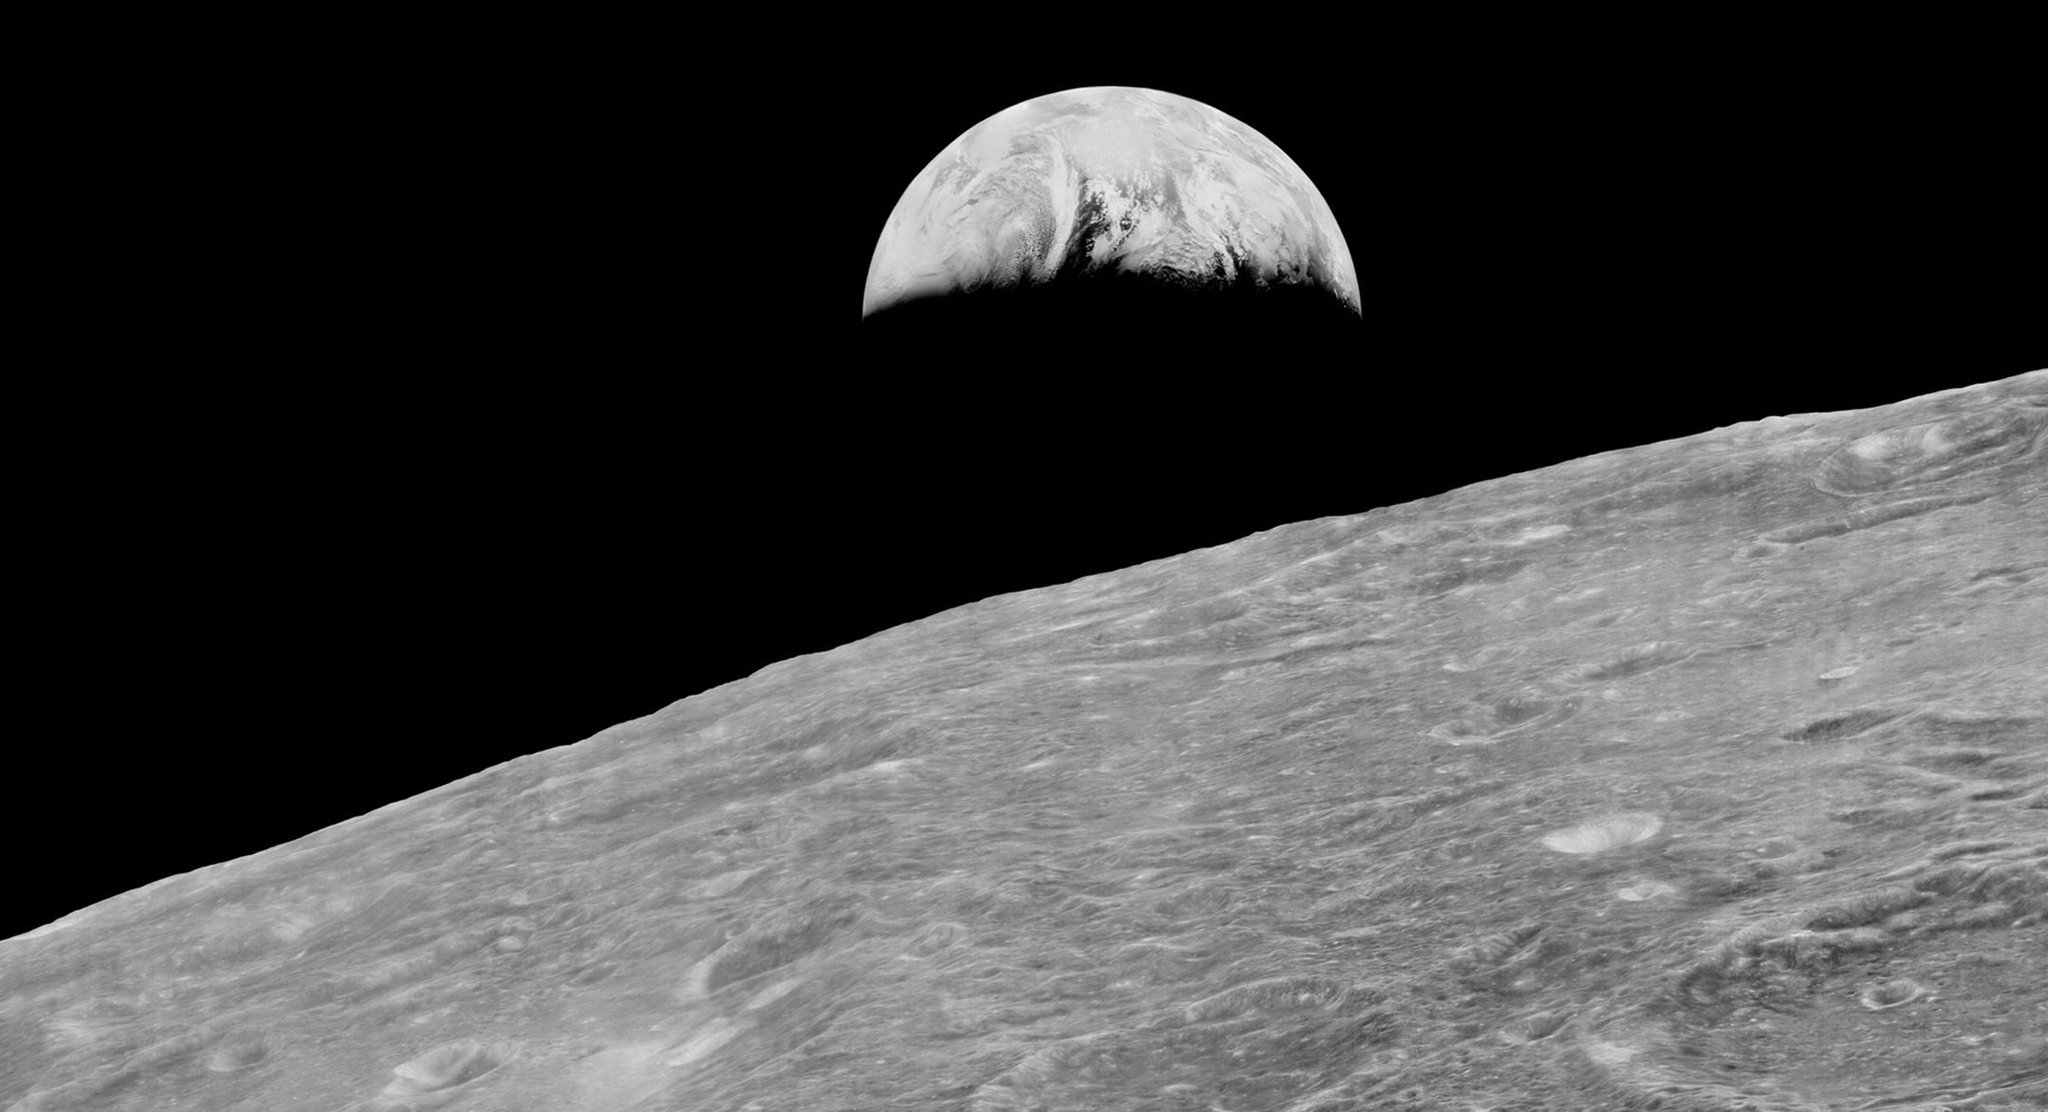 советские фото солнца с луны действовали уверенно взяли